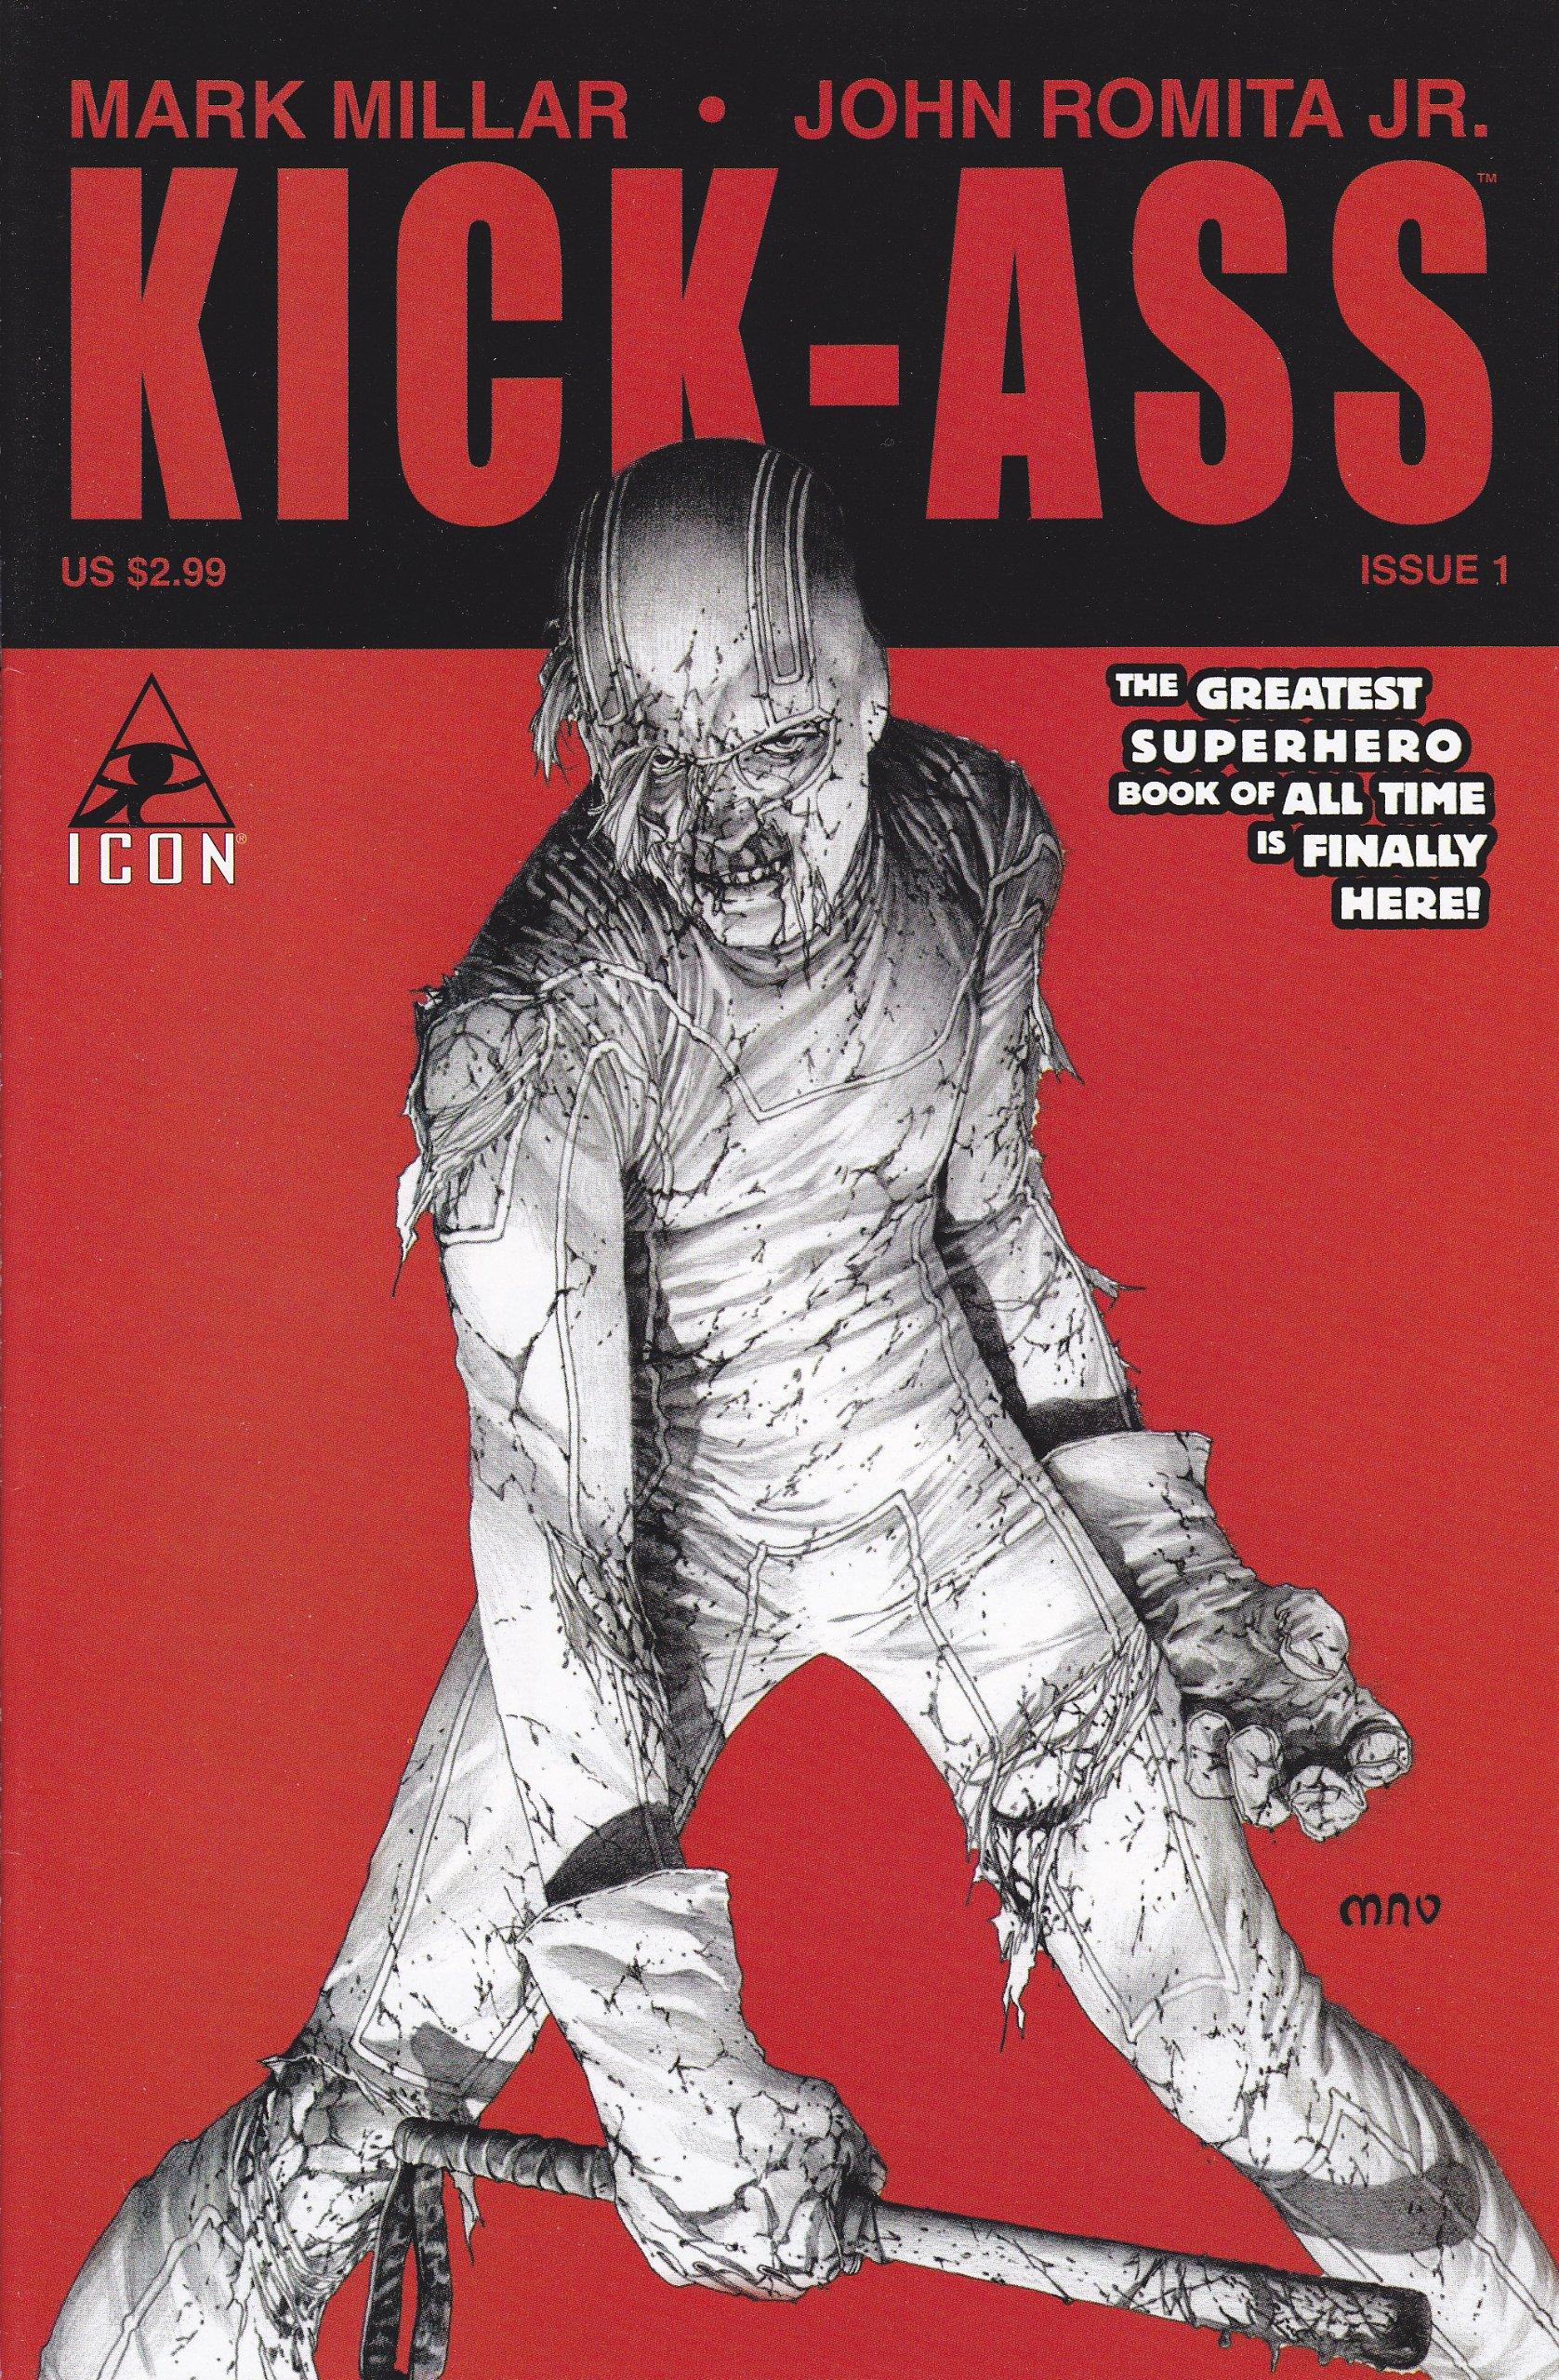 Download Kick-Ass #1 B Retailer Incentive Variant Cover B ebook